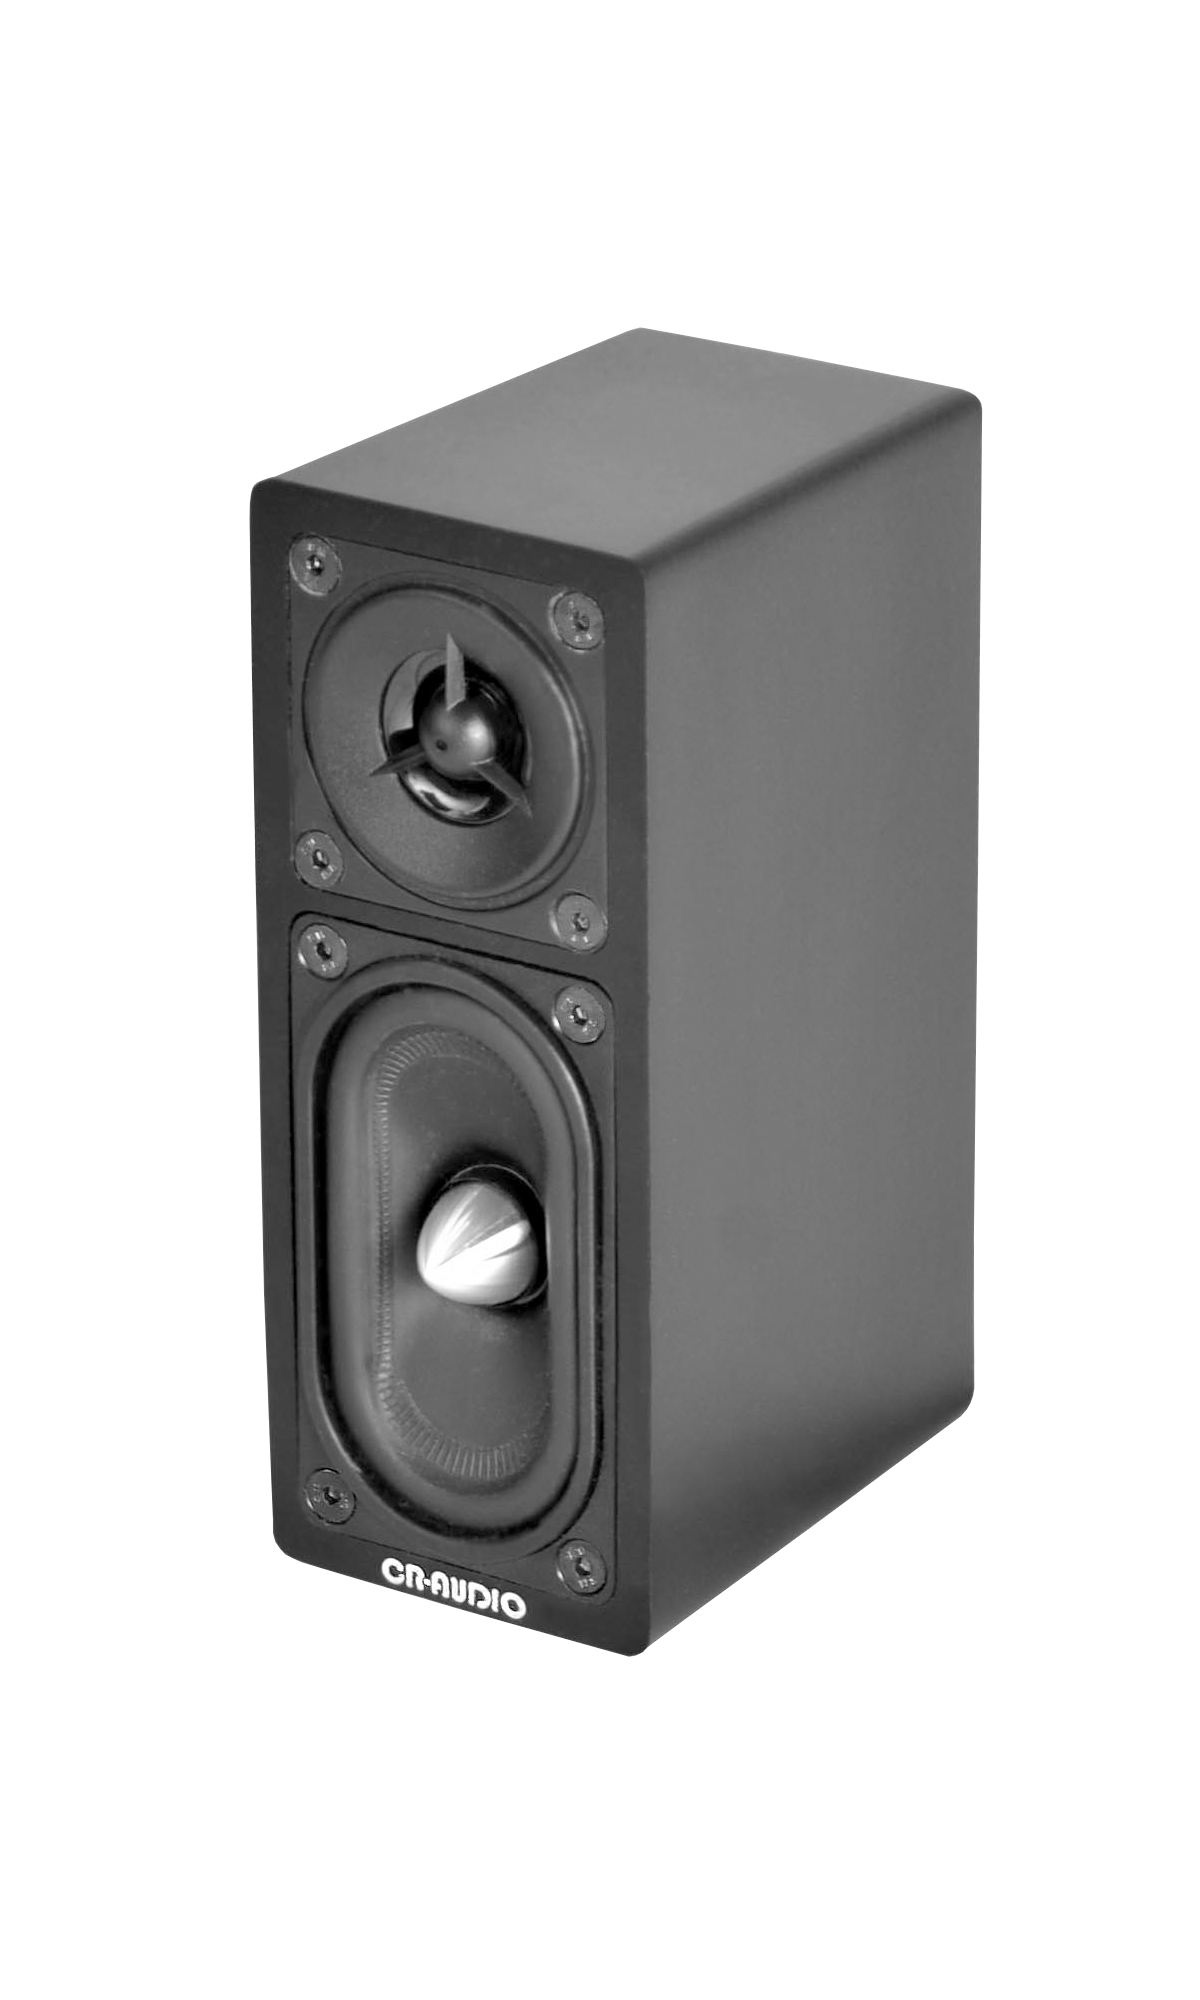 Lautsprecher Minox Satelliten Lautsprecher